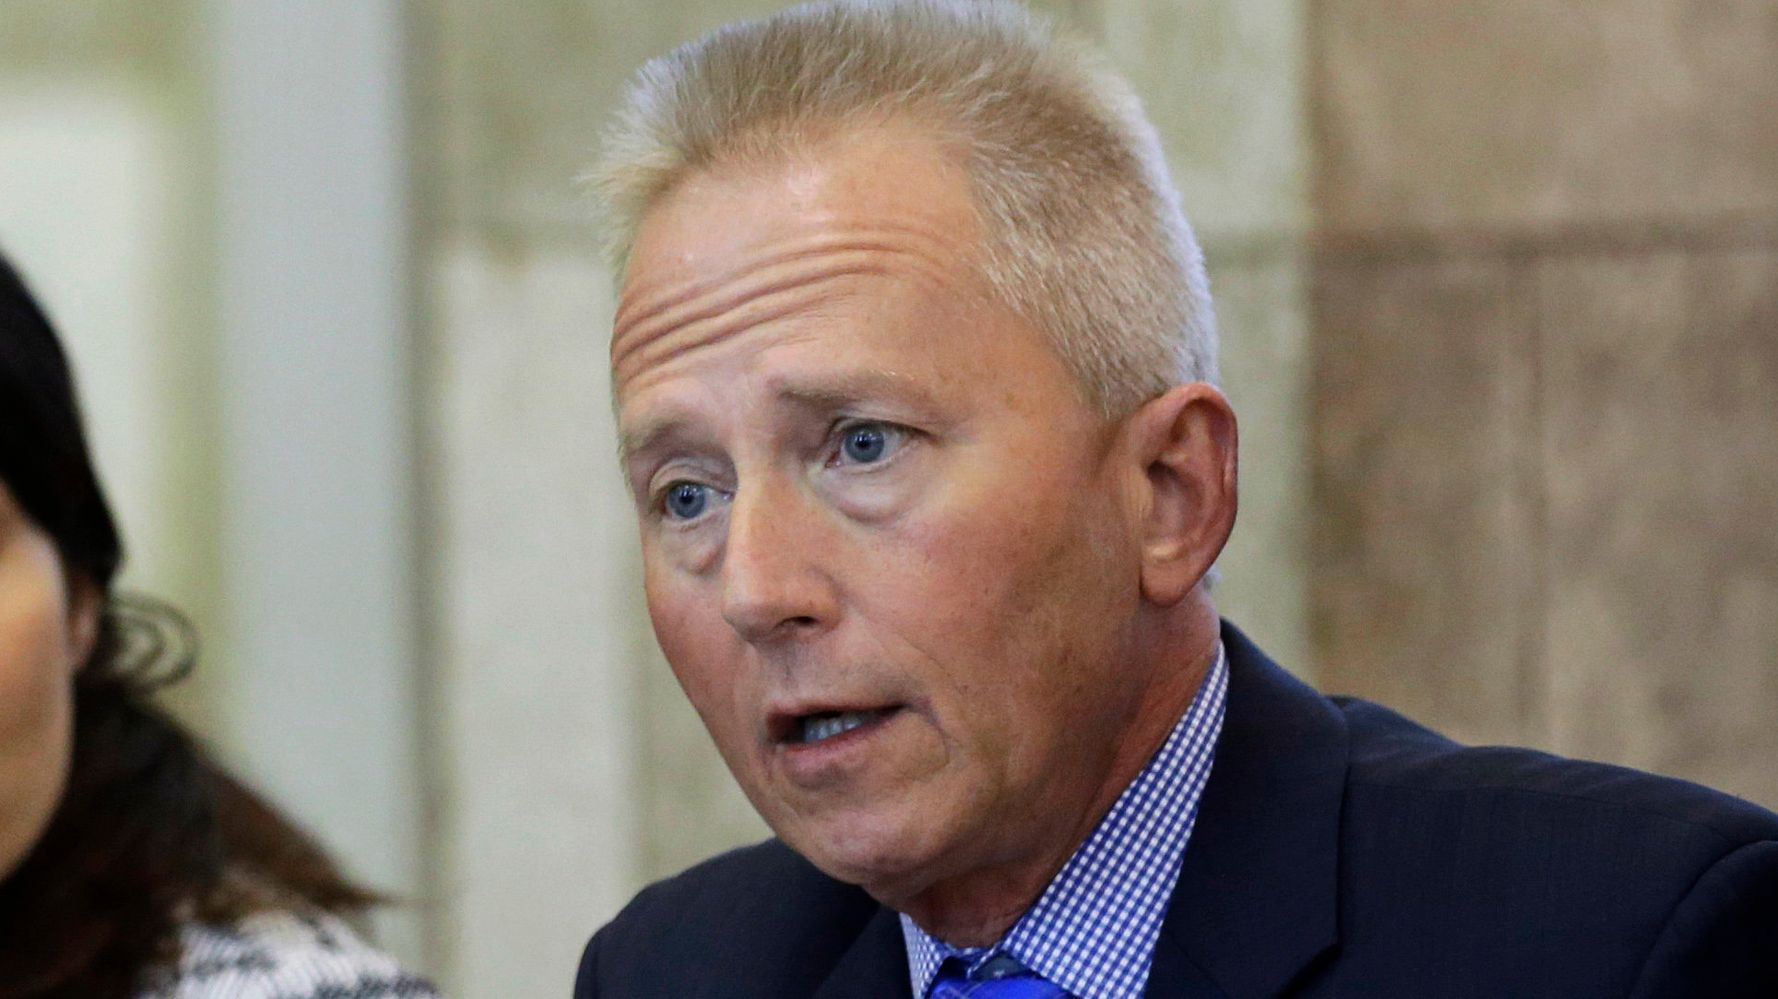 Democratic Rep. Jeff Van Drew Reportedly Planning On Switching Parties Over Impeachment